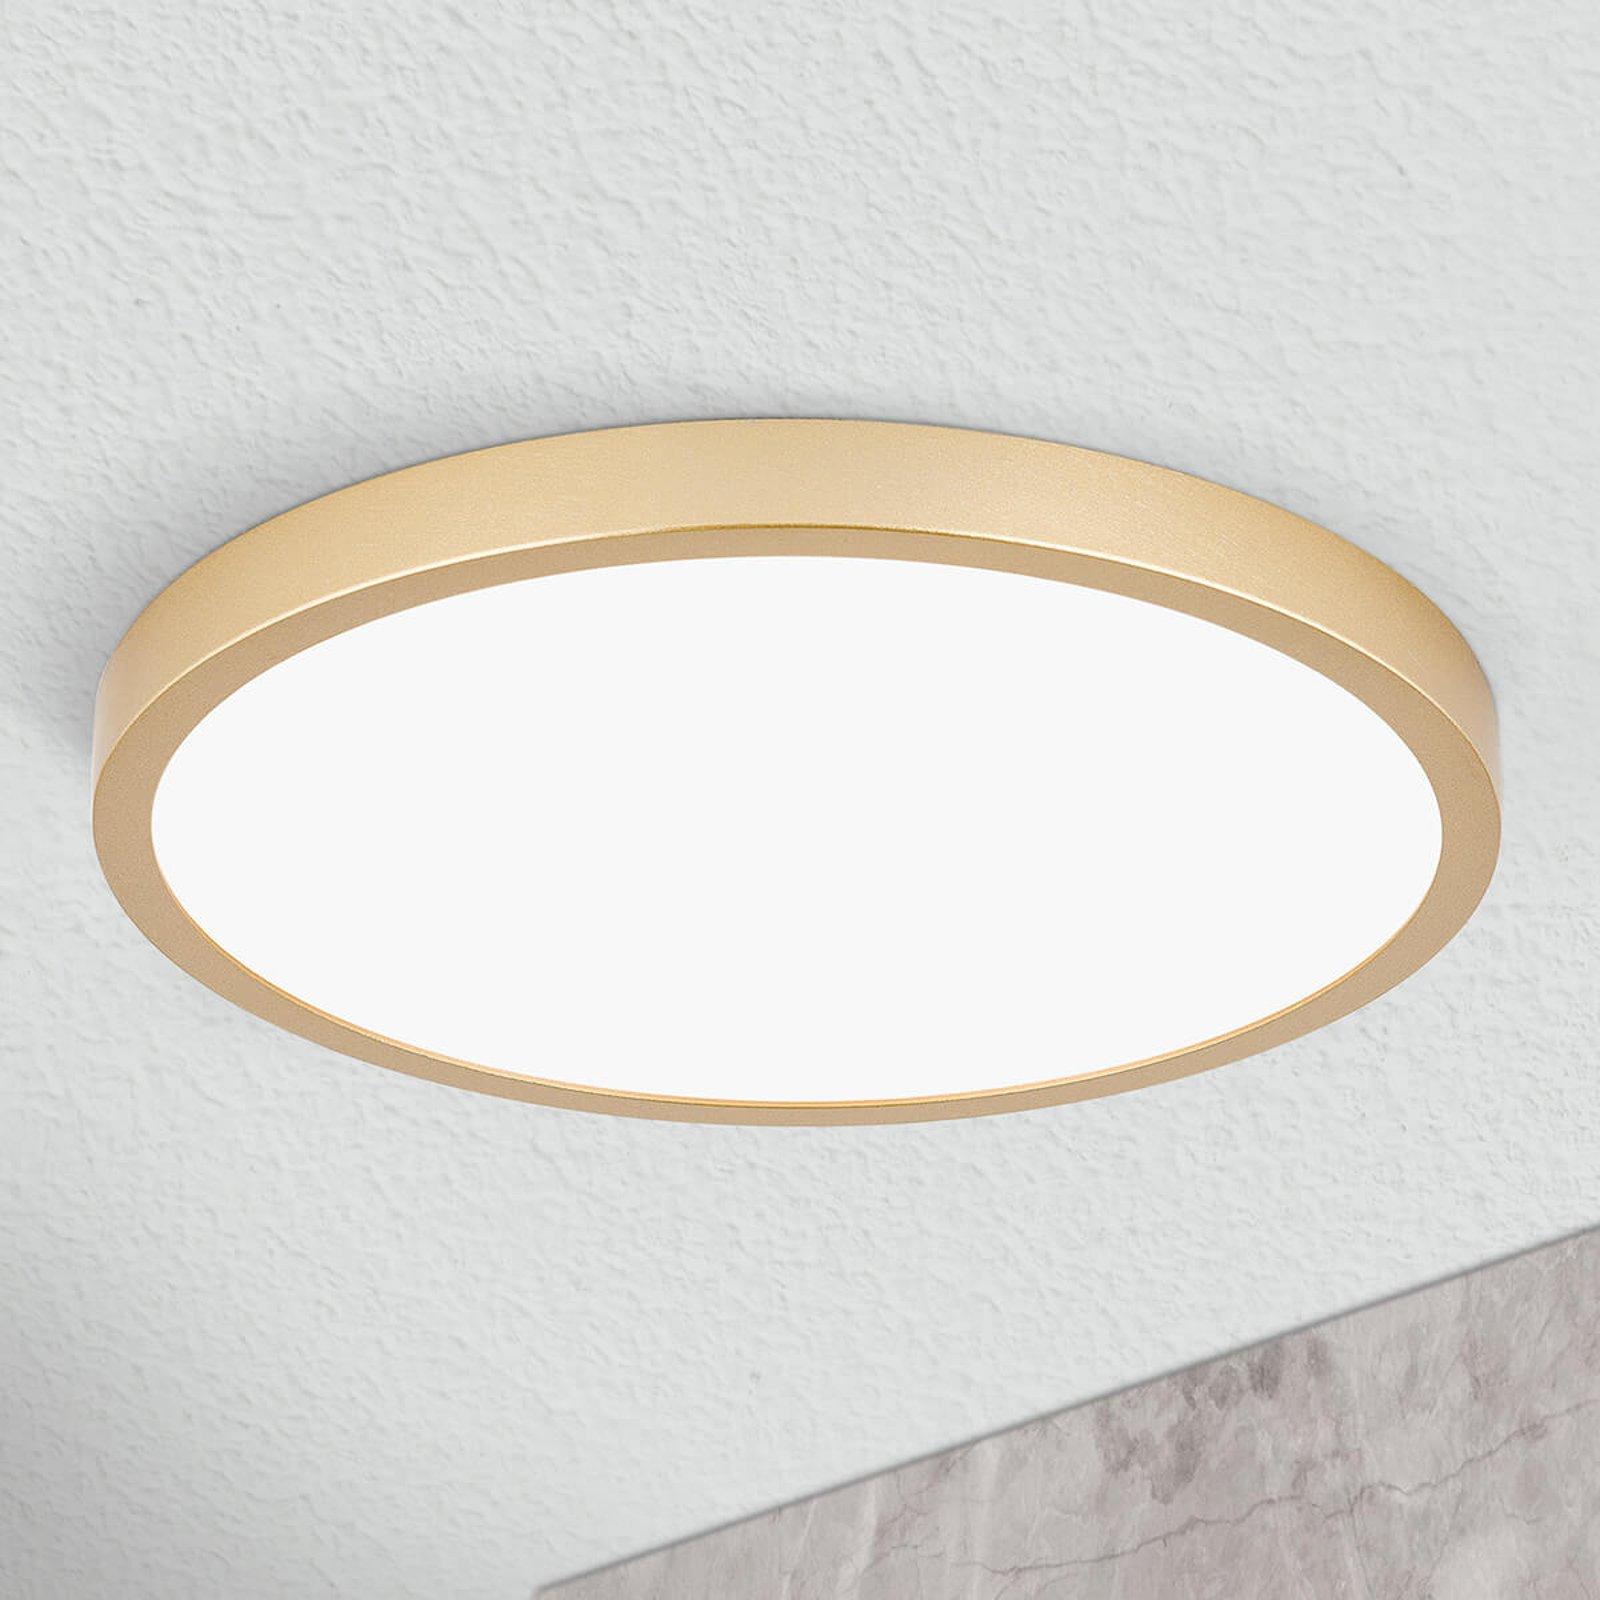 LED-taklampe Vika, rund, gull matt, Ø 30cm